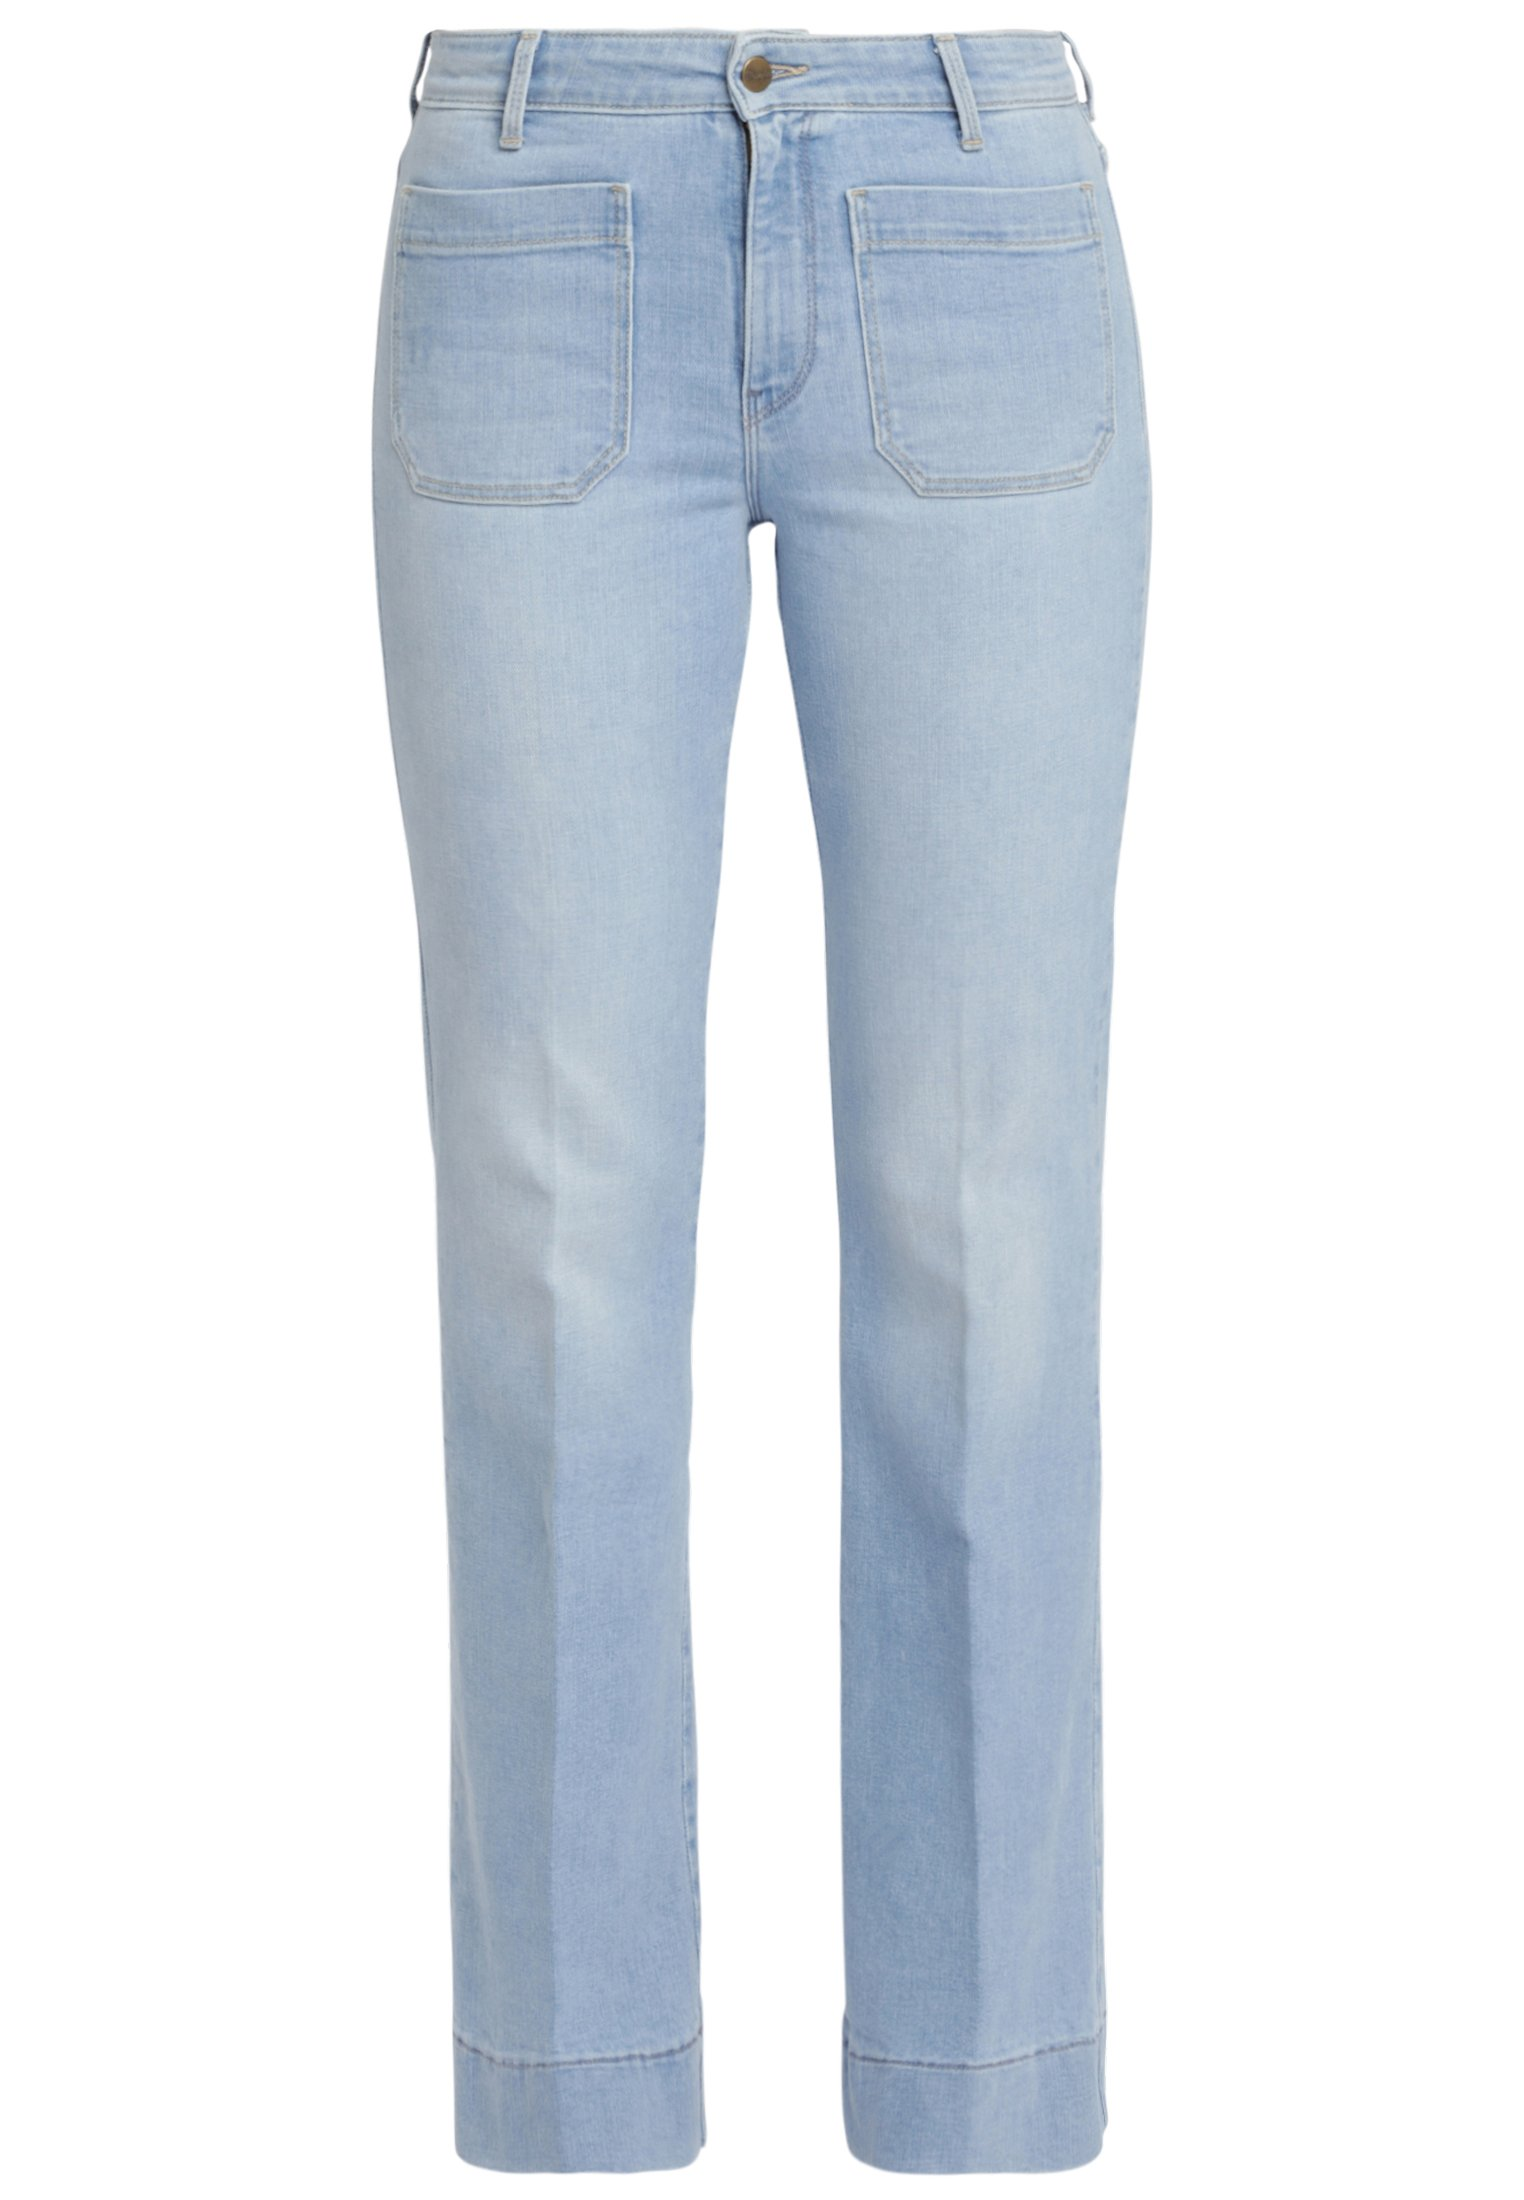 Wrangler Flared Jeans - Authentic Dark